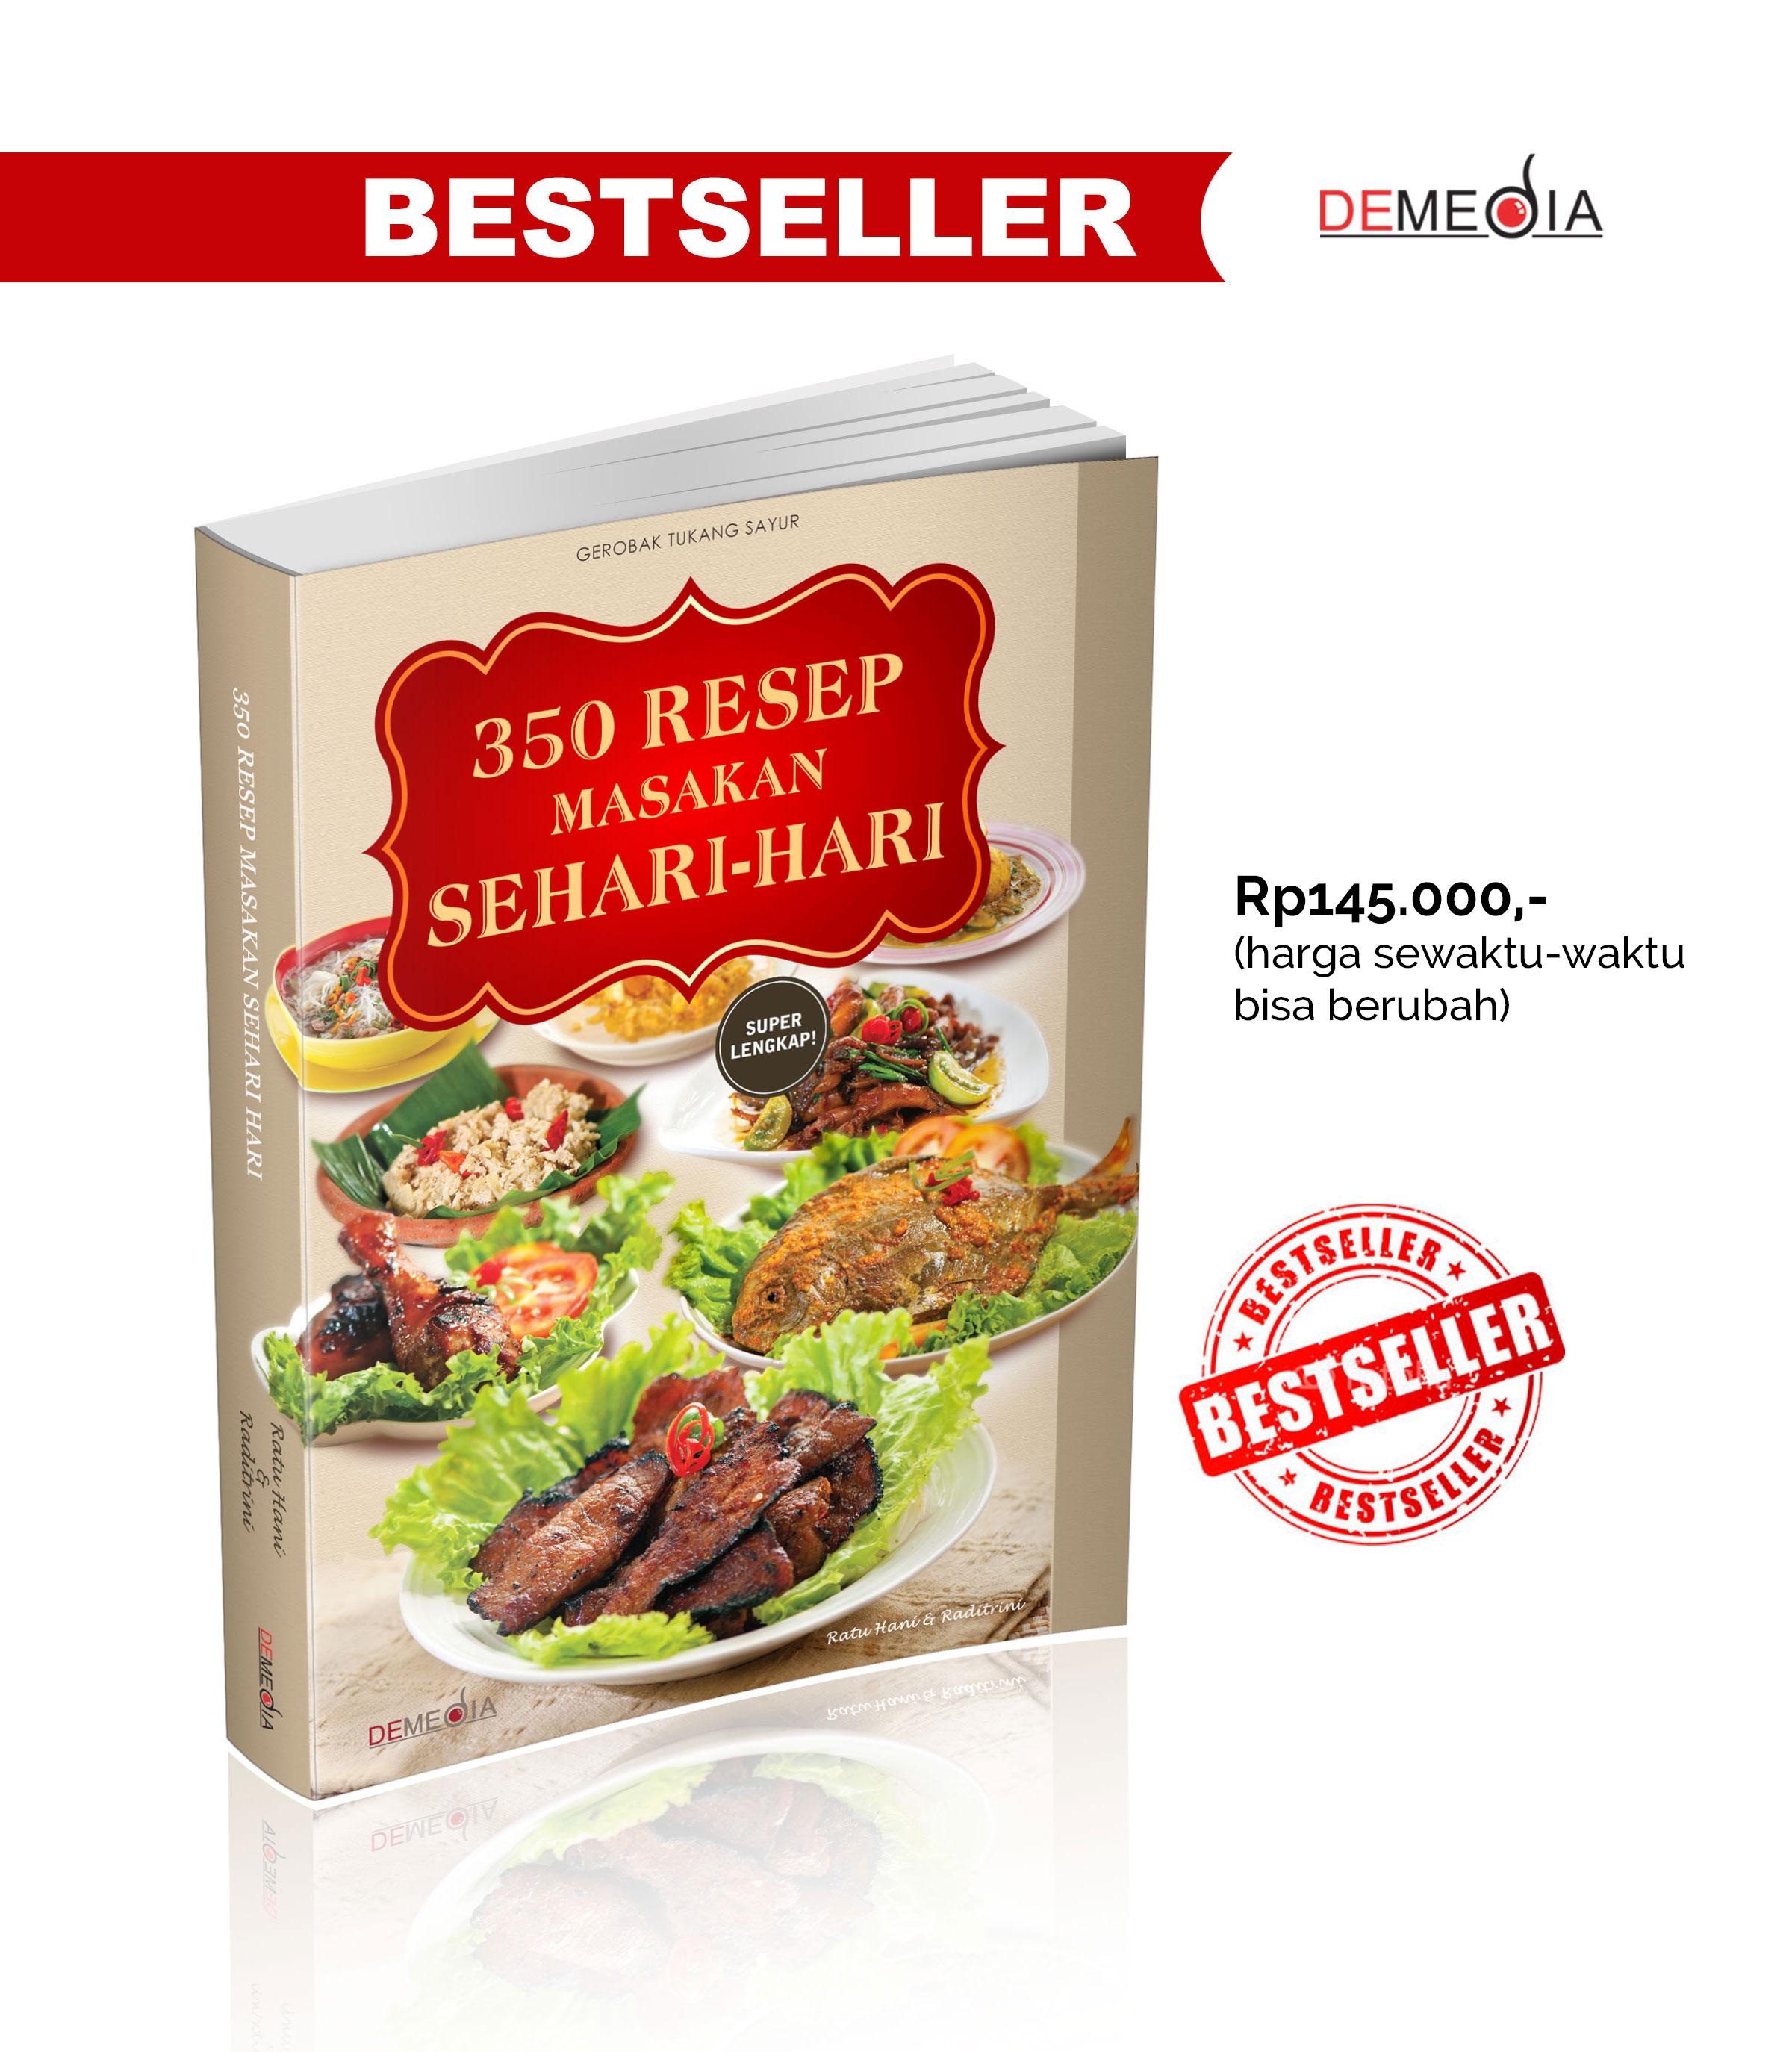 bestseller1_demedia_harga